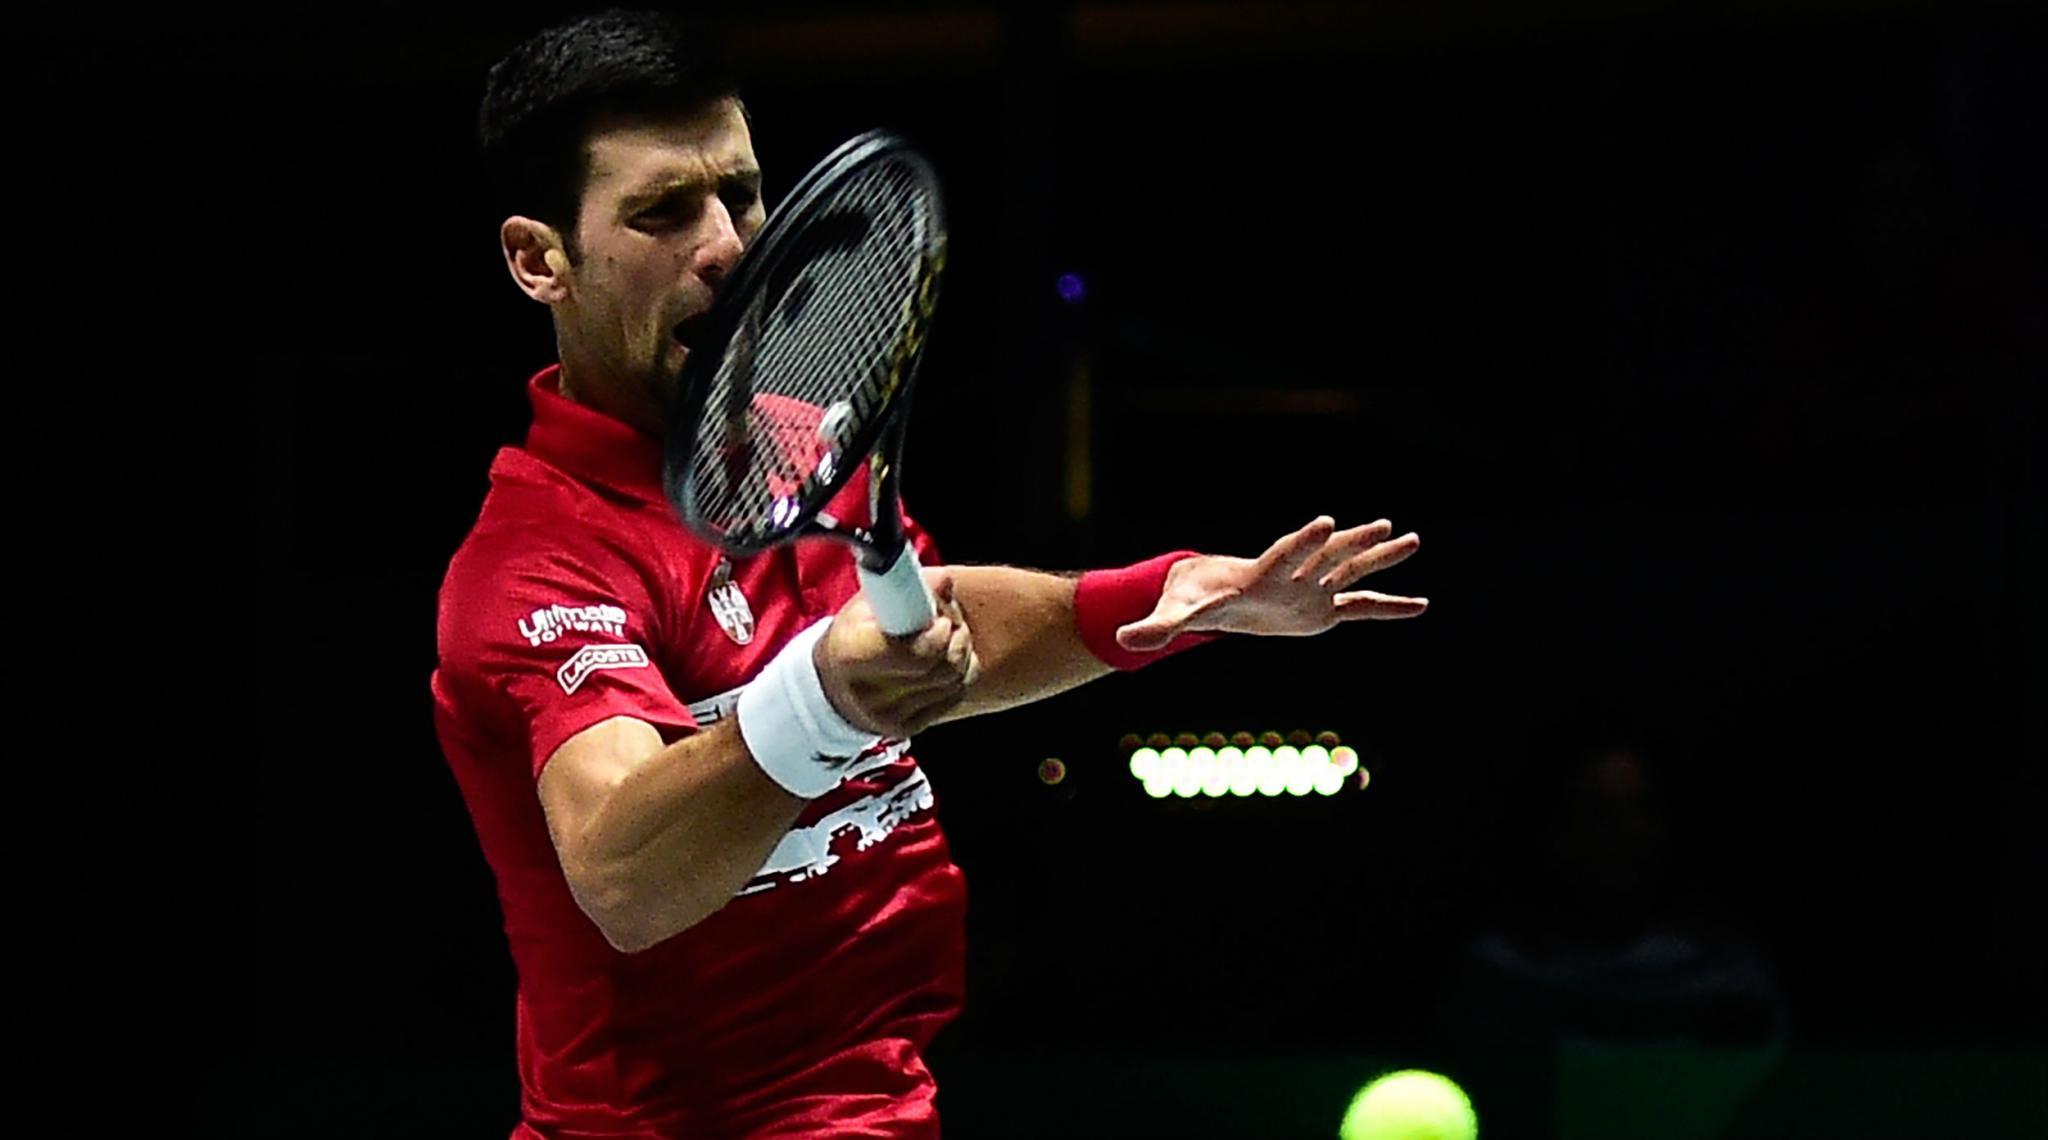 Novak Djokovic Sends Serbia into Quarter-Finals as France's Benoit Paire Knocked Out of Davis Cup 2019